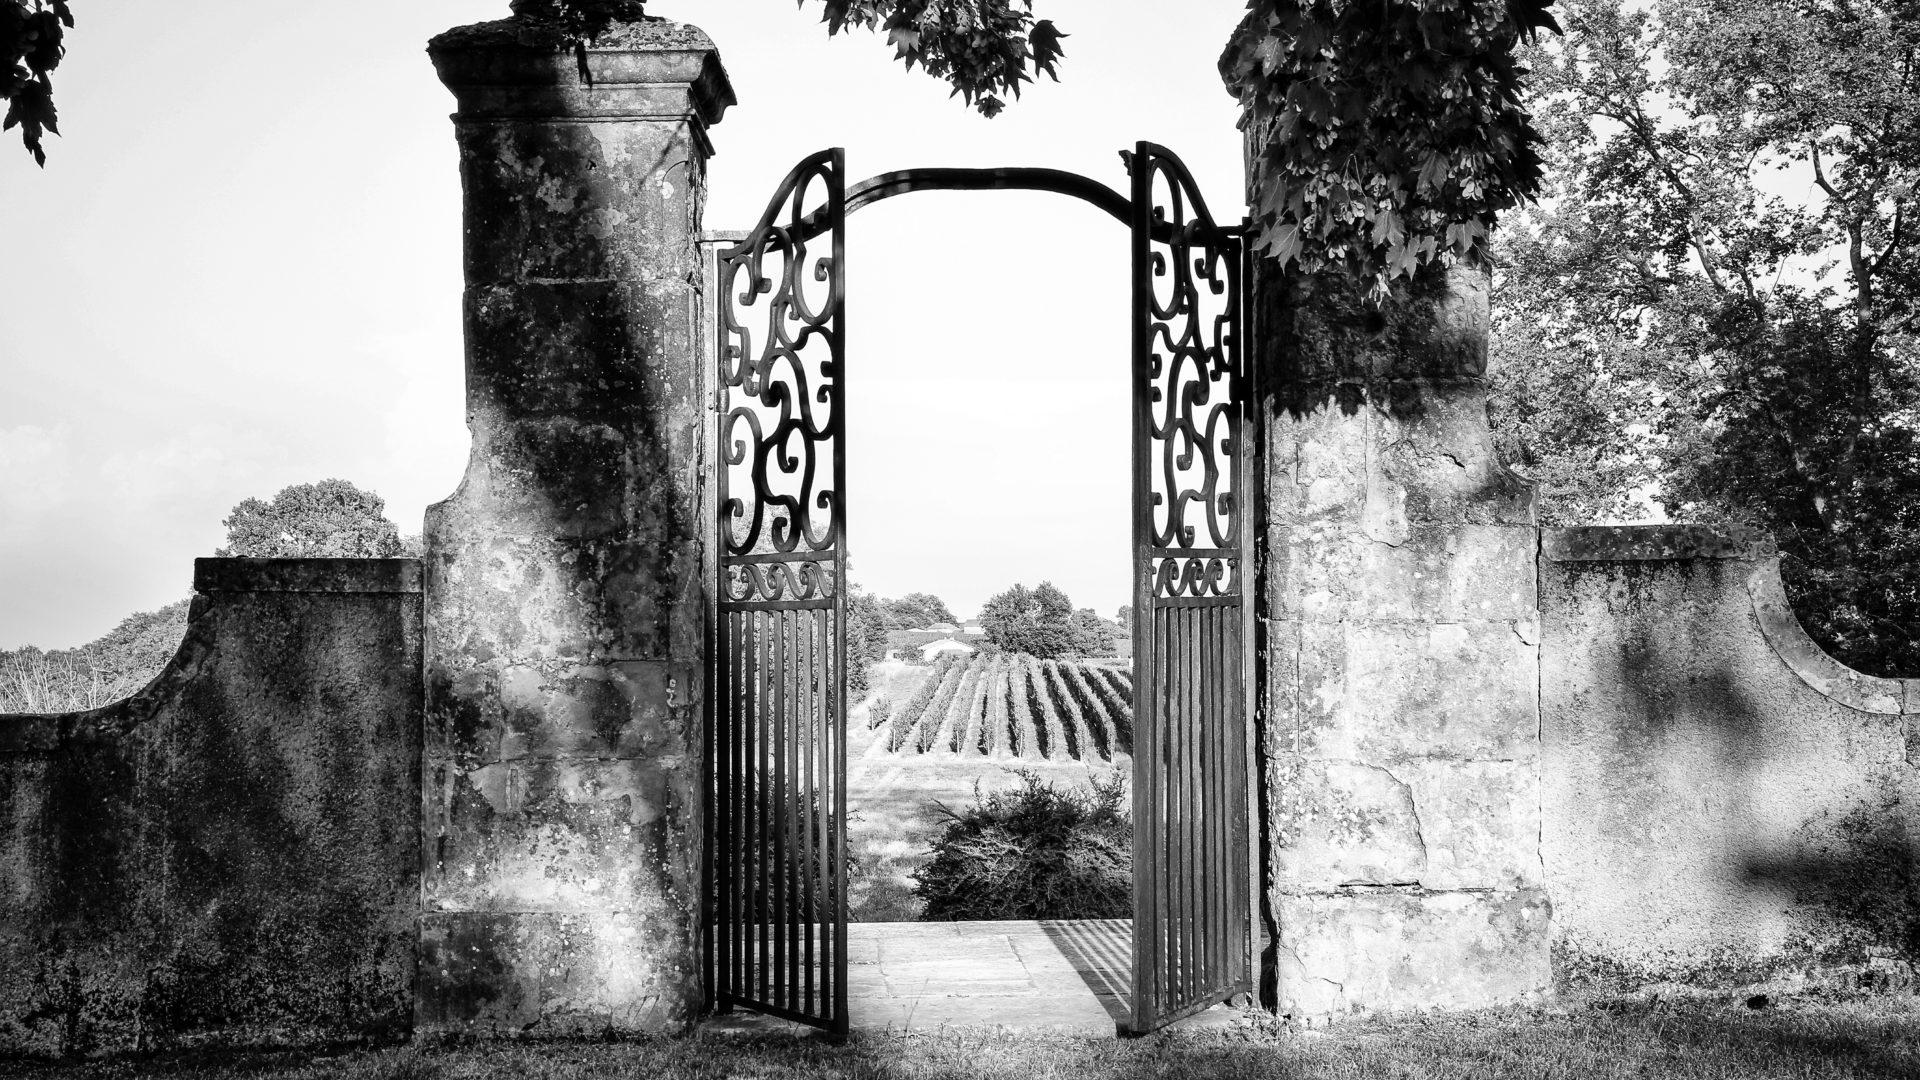 monastere-1920x1080.jpg